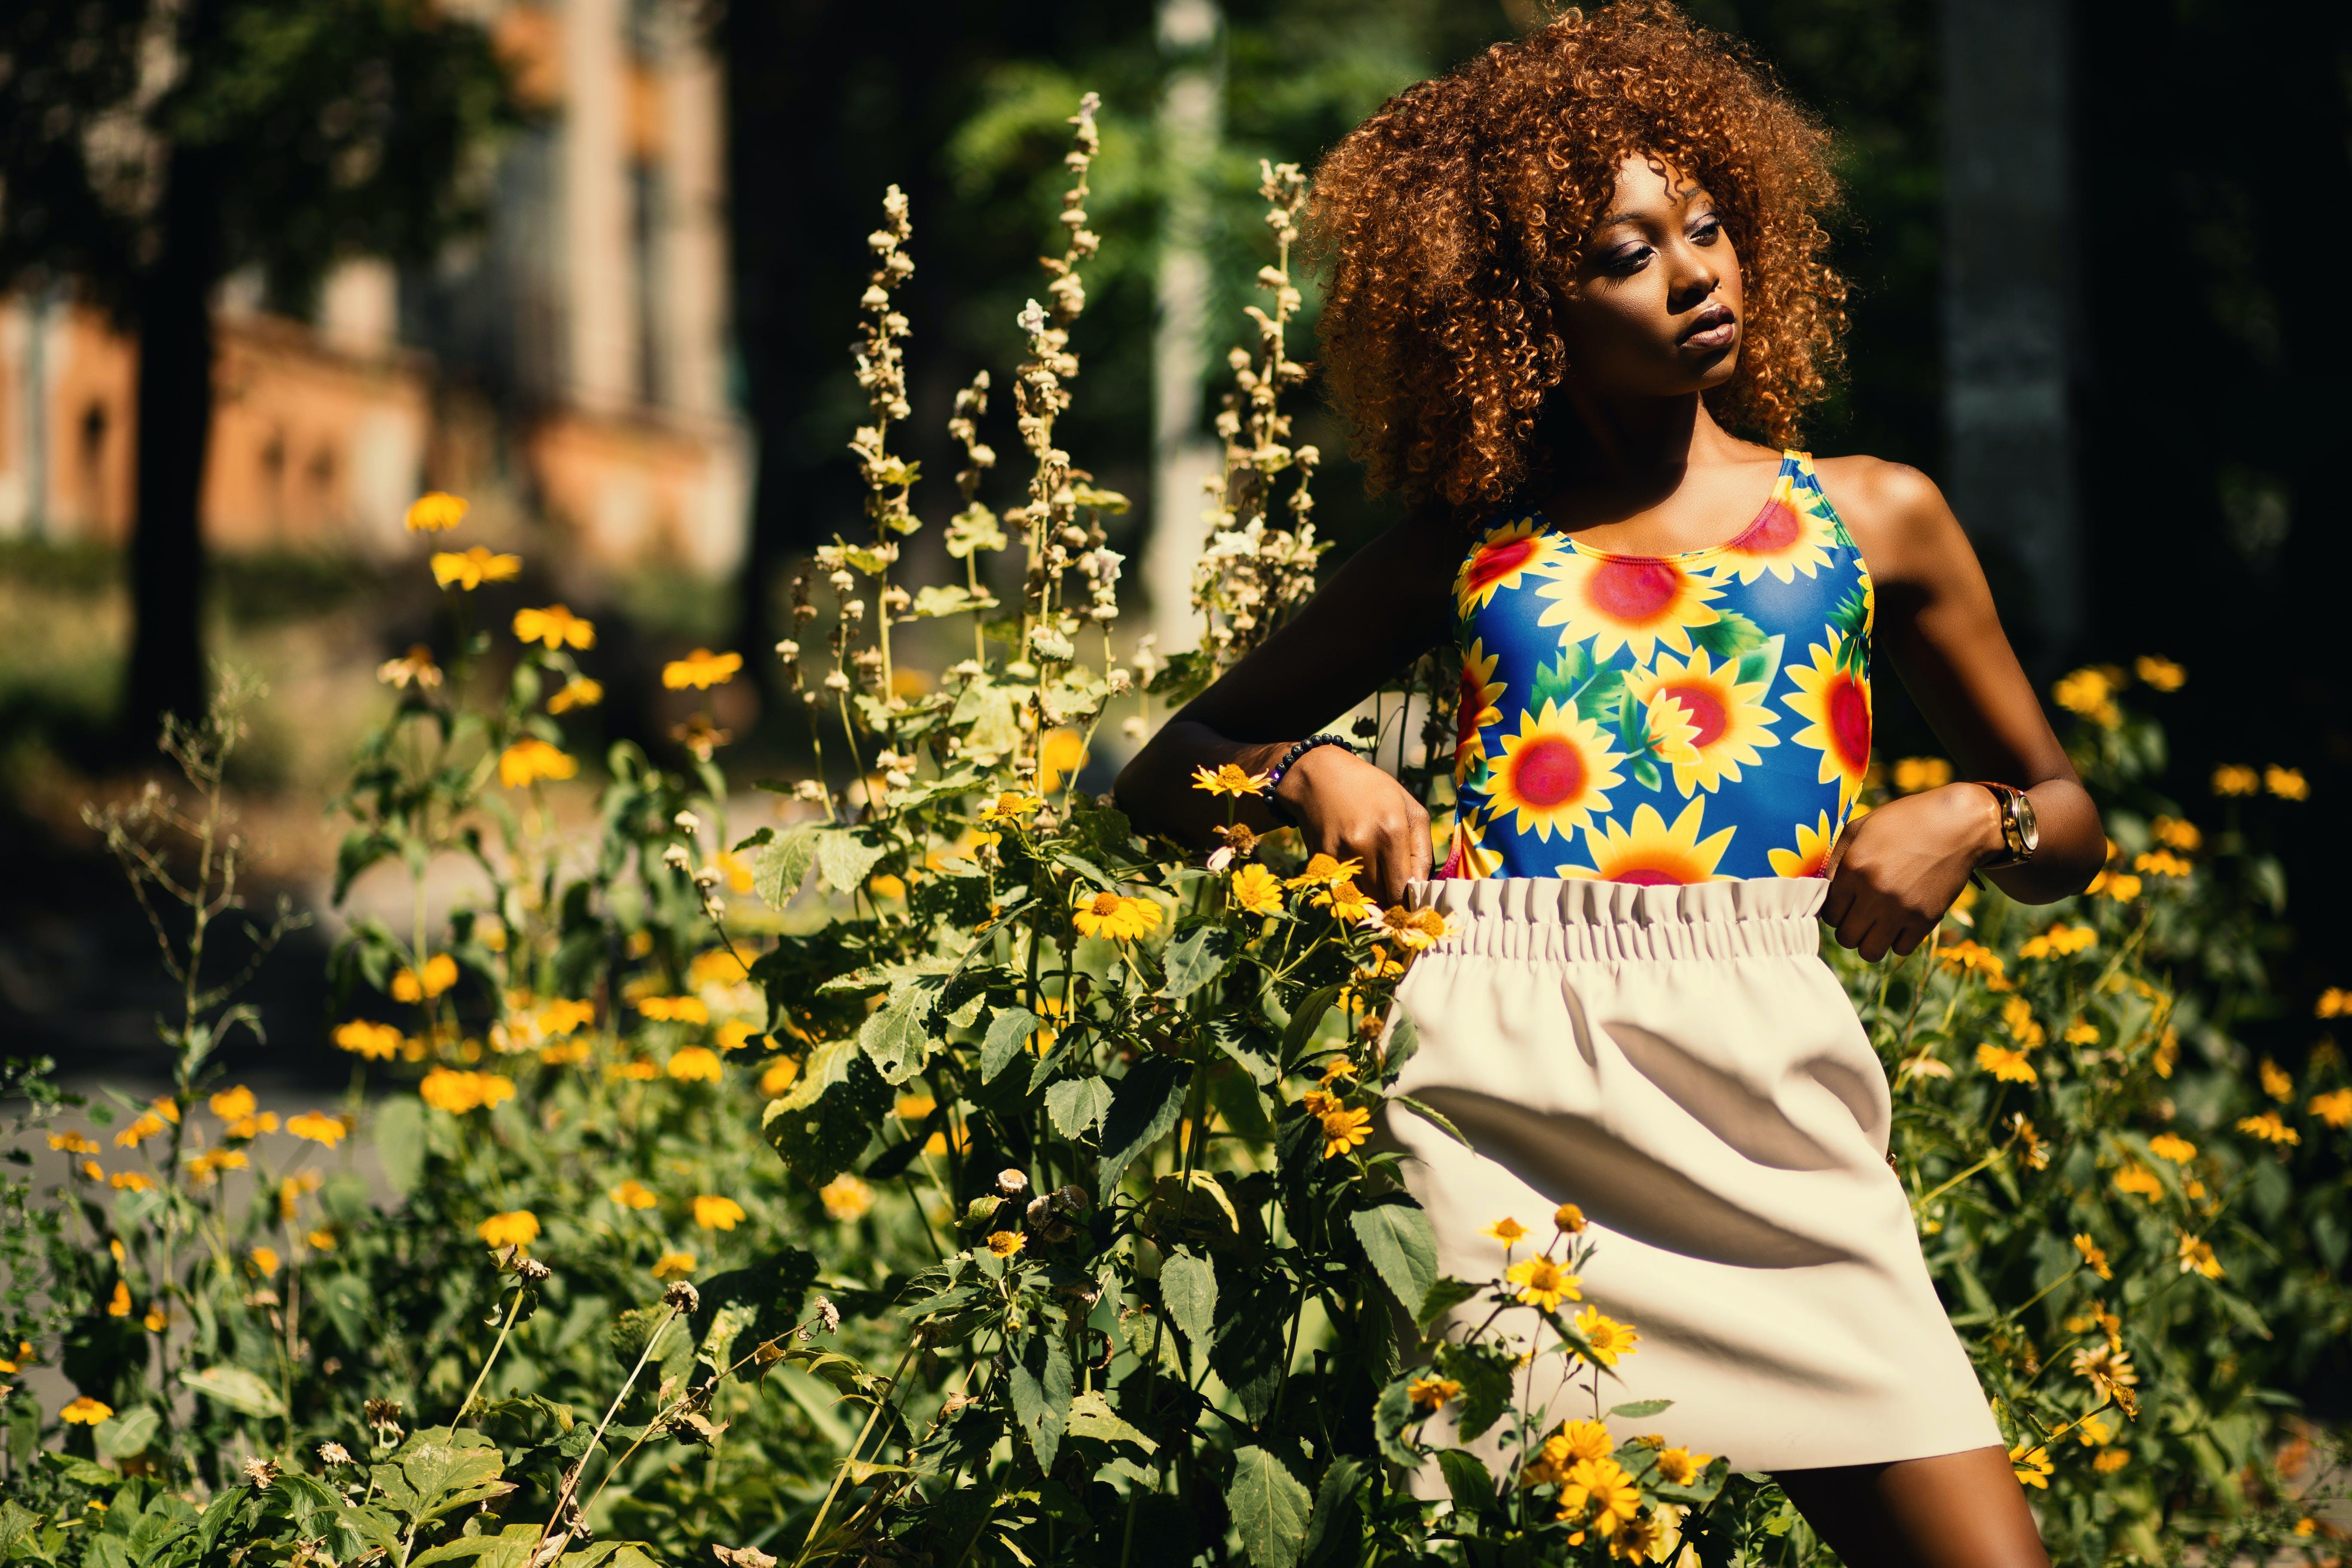 Kostenloses Stock Foto zu afroamerikaner-frau, blumen, farbige frau, fashion